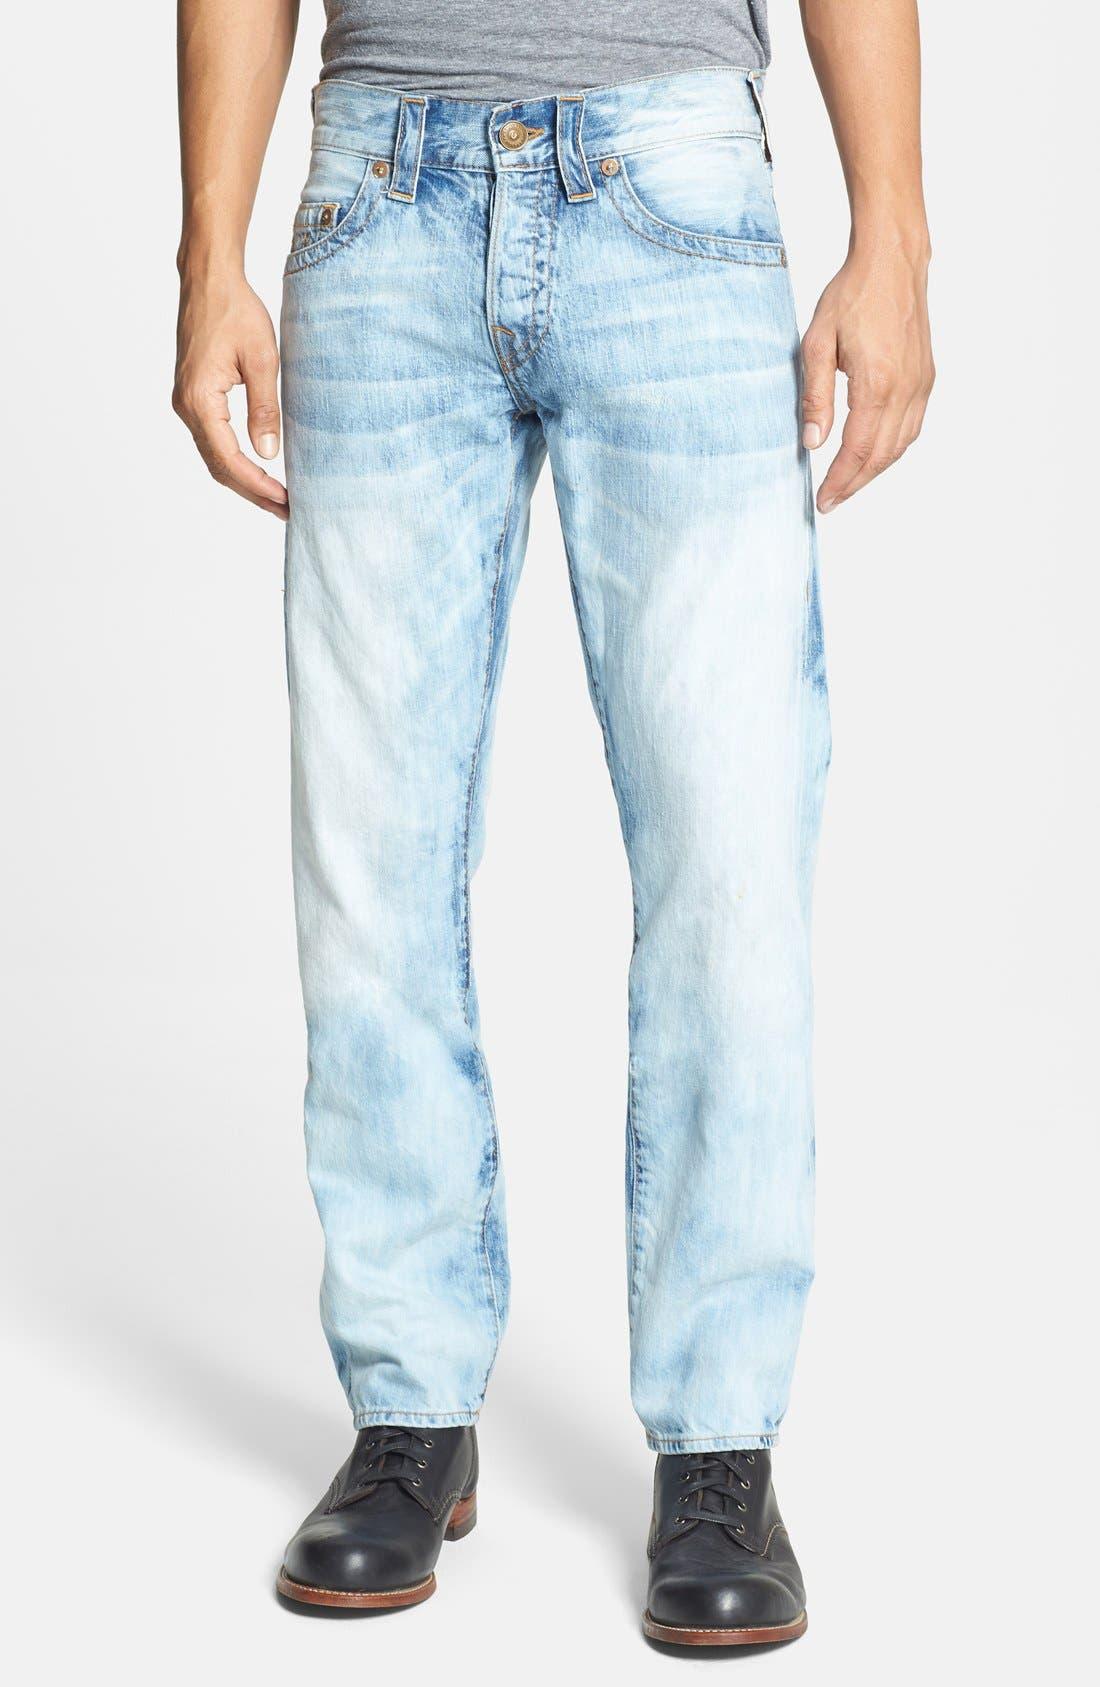 Alternate Image 2  - True Religion Brand Jeans 'Geno' Straight Leg Jeans (YLL Antelope)